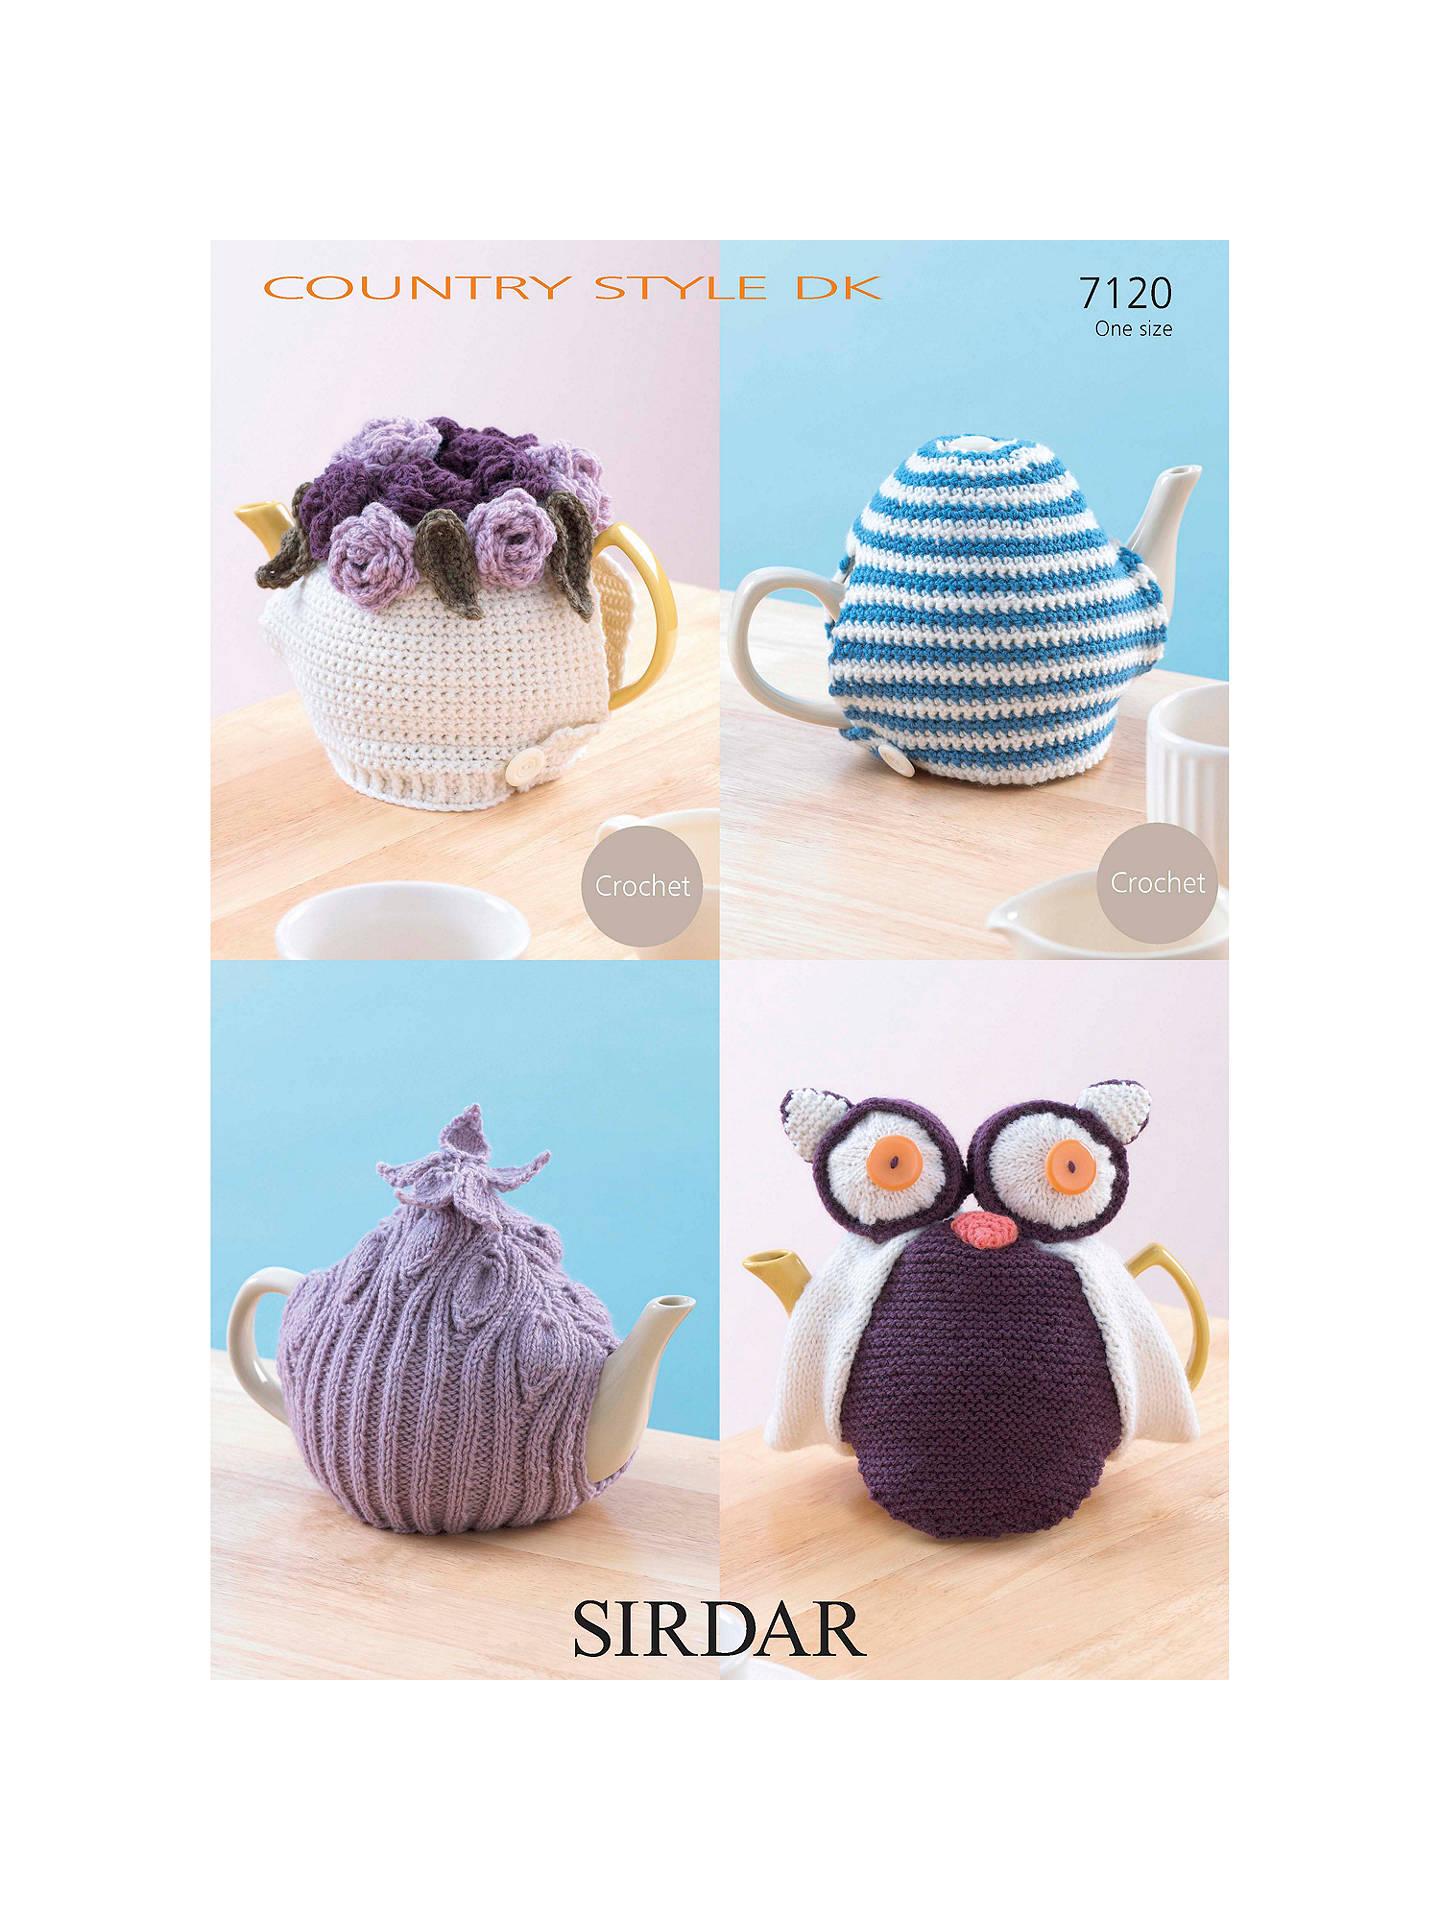 Sirdar Dk Tea Cosy Knitting Crochet Patterns 7120 At John Lewis